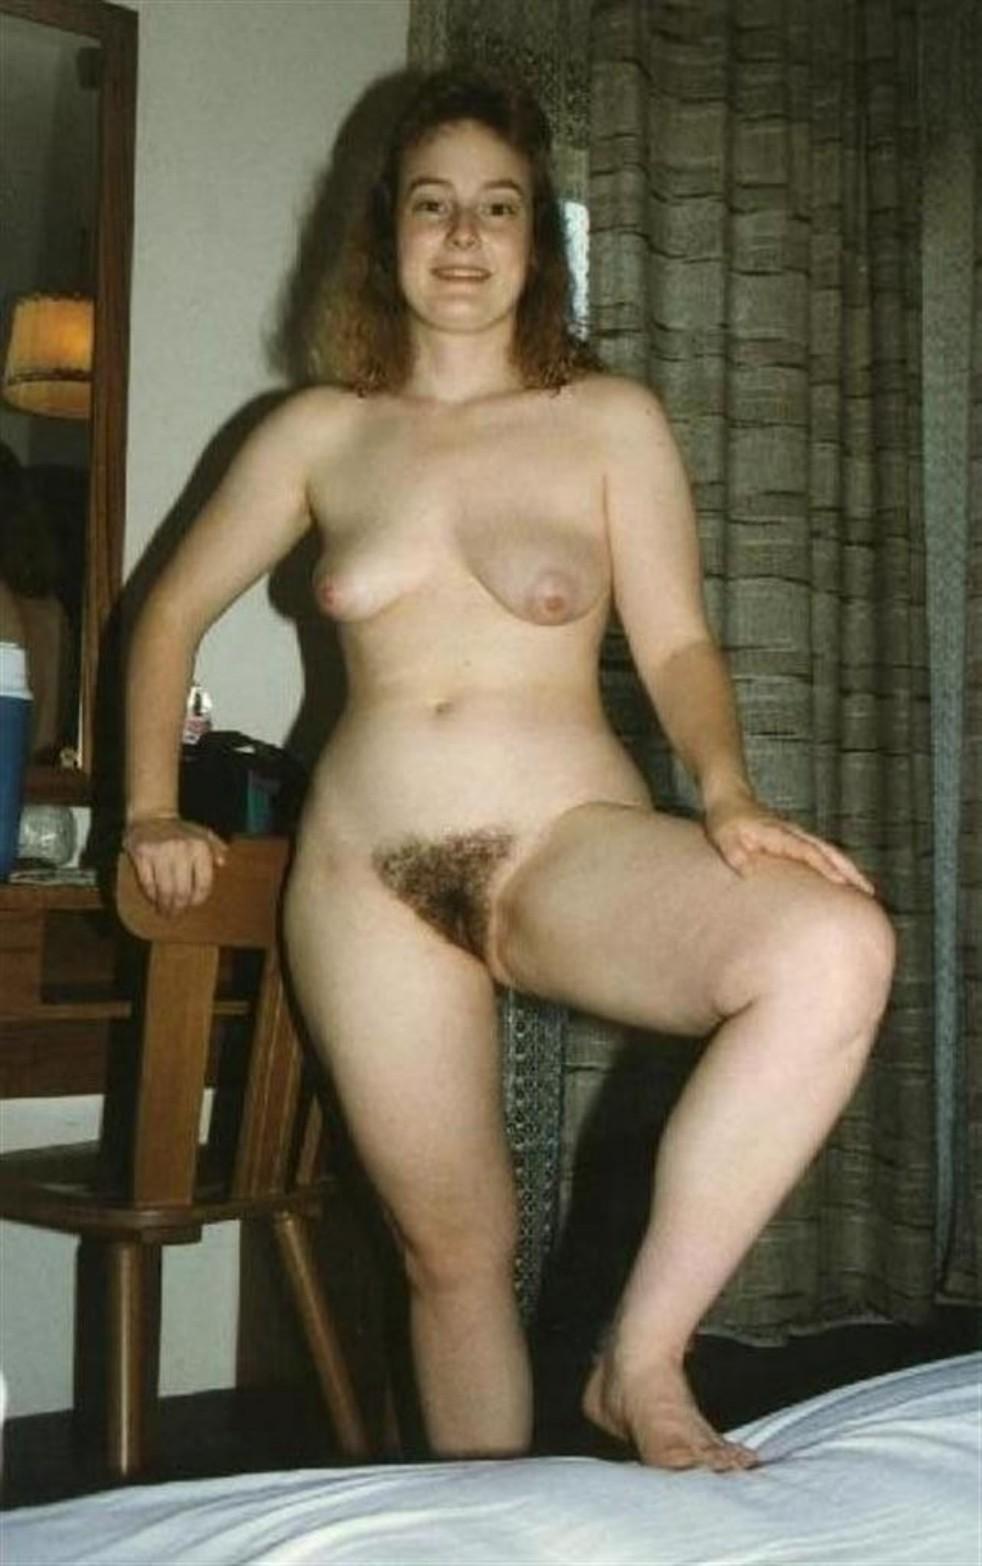 Girl pissing nude gif